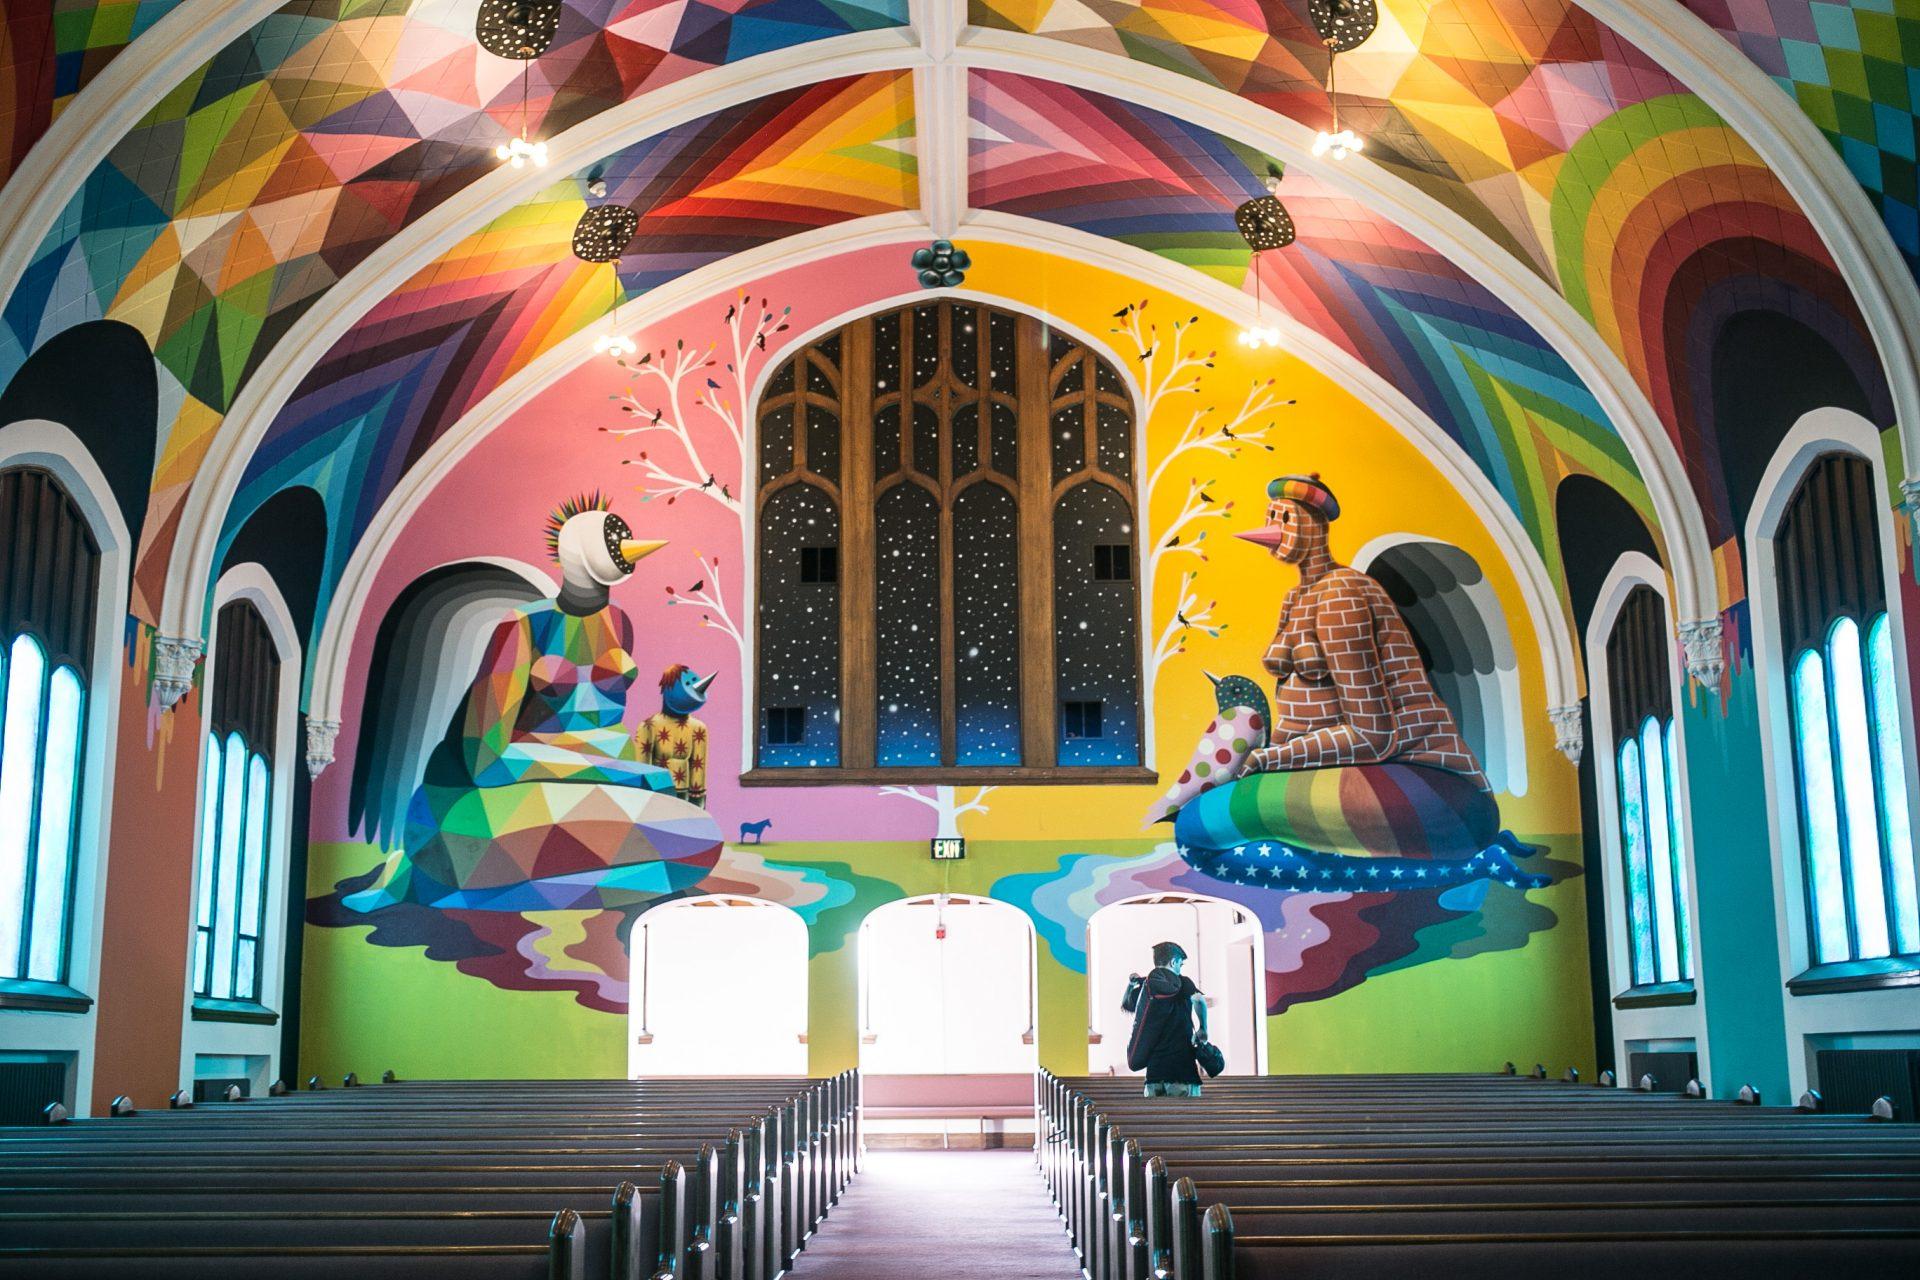 Okuda mural at International Church of Cannabis in Denver Colorado